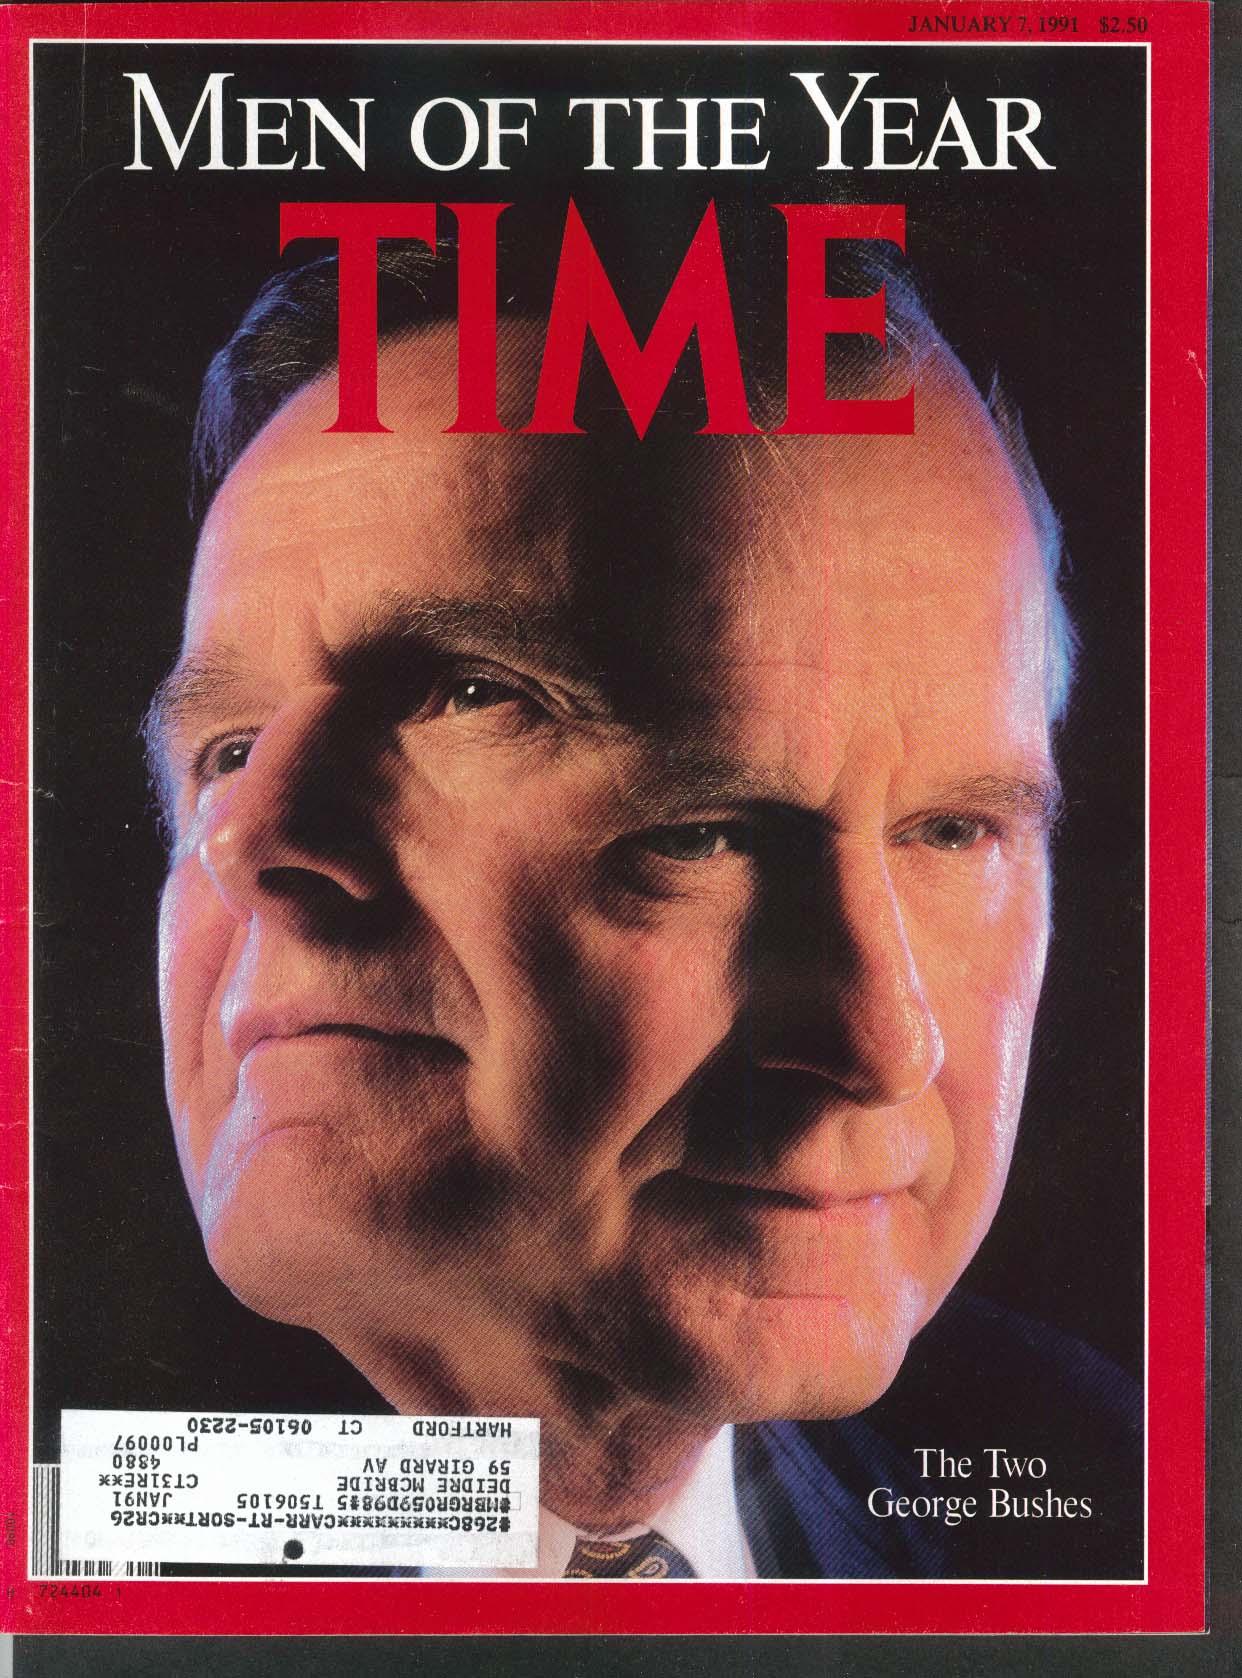 TIME George Bush Saddam Hussein Mikhail Gorbachev Nelson Mandela + 1/7 1991